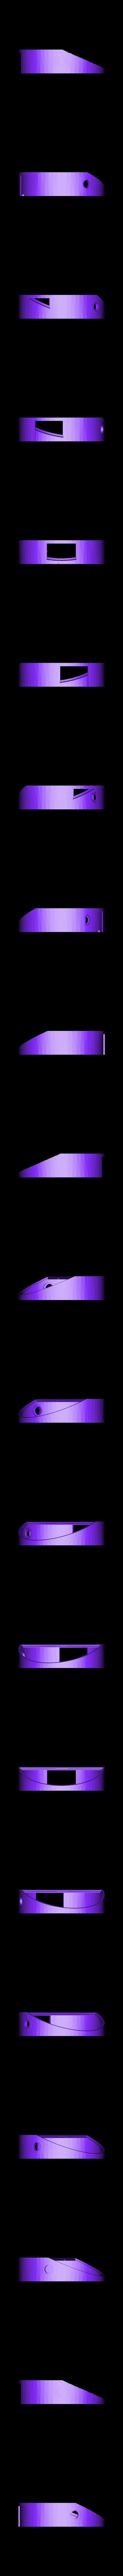 SOCLE.STL Download free STL file Raspberry Pi case • 3D print object, YAN-D